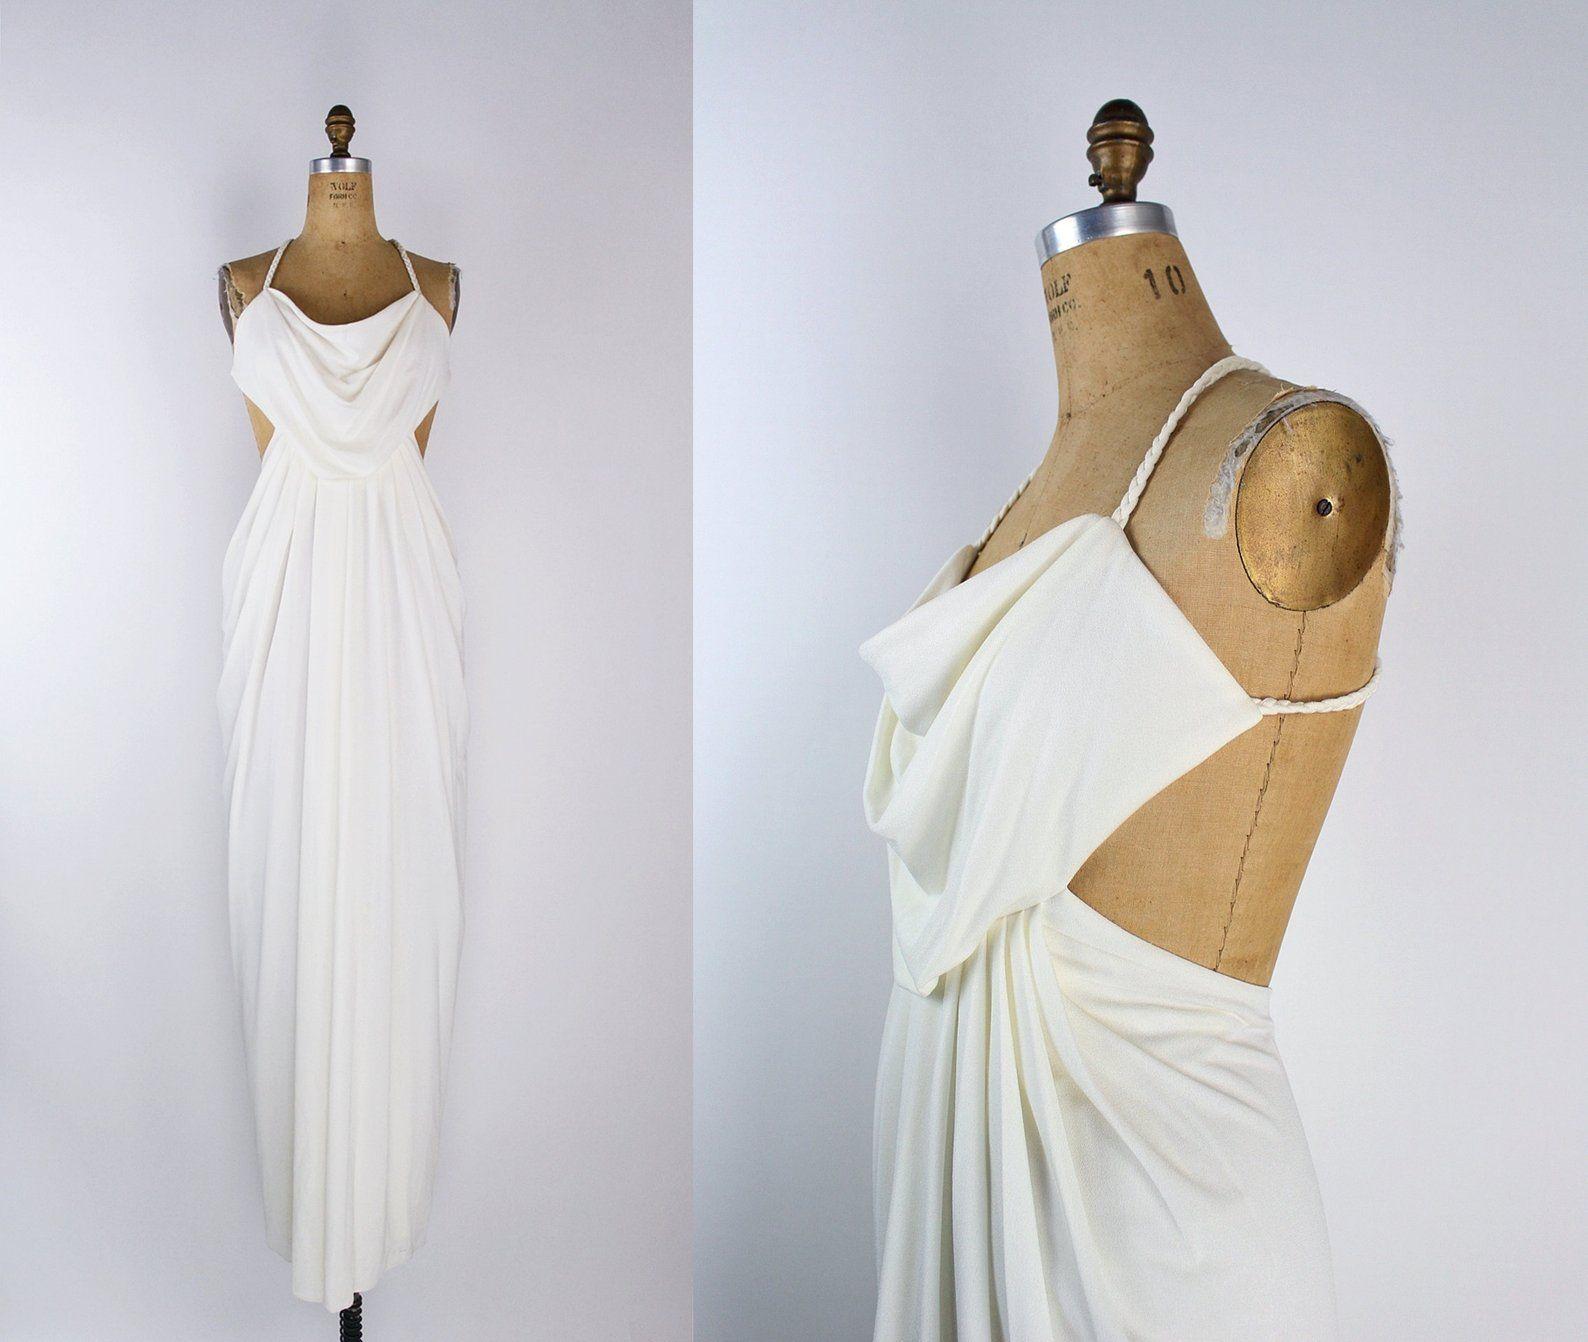 70s White Goddess Maxi Dress White Disco Dress Open Back Etsy Goddess Maxi Dress Disco Dress White Maxi Dresses [ 1342 x 1588 Pixel ]